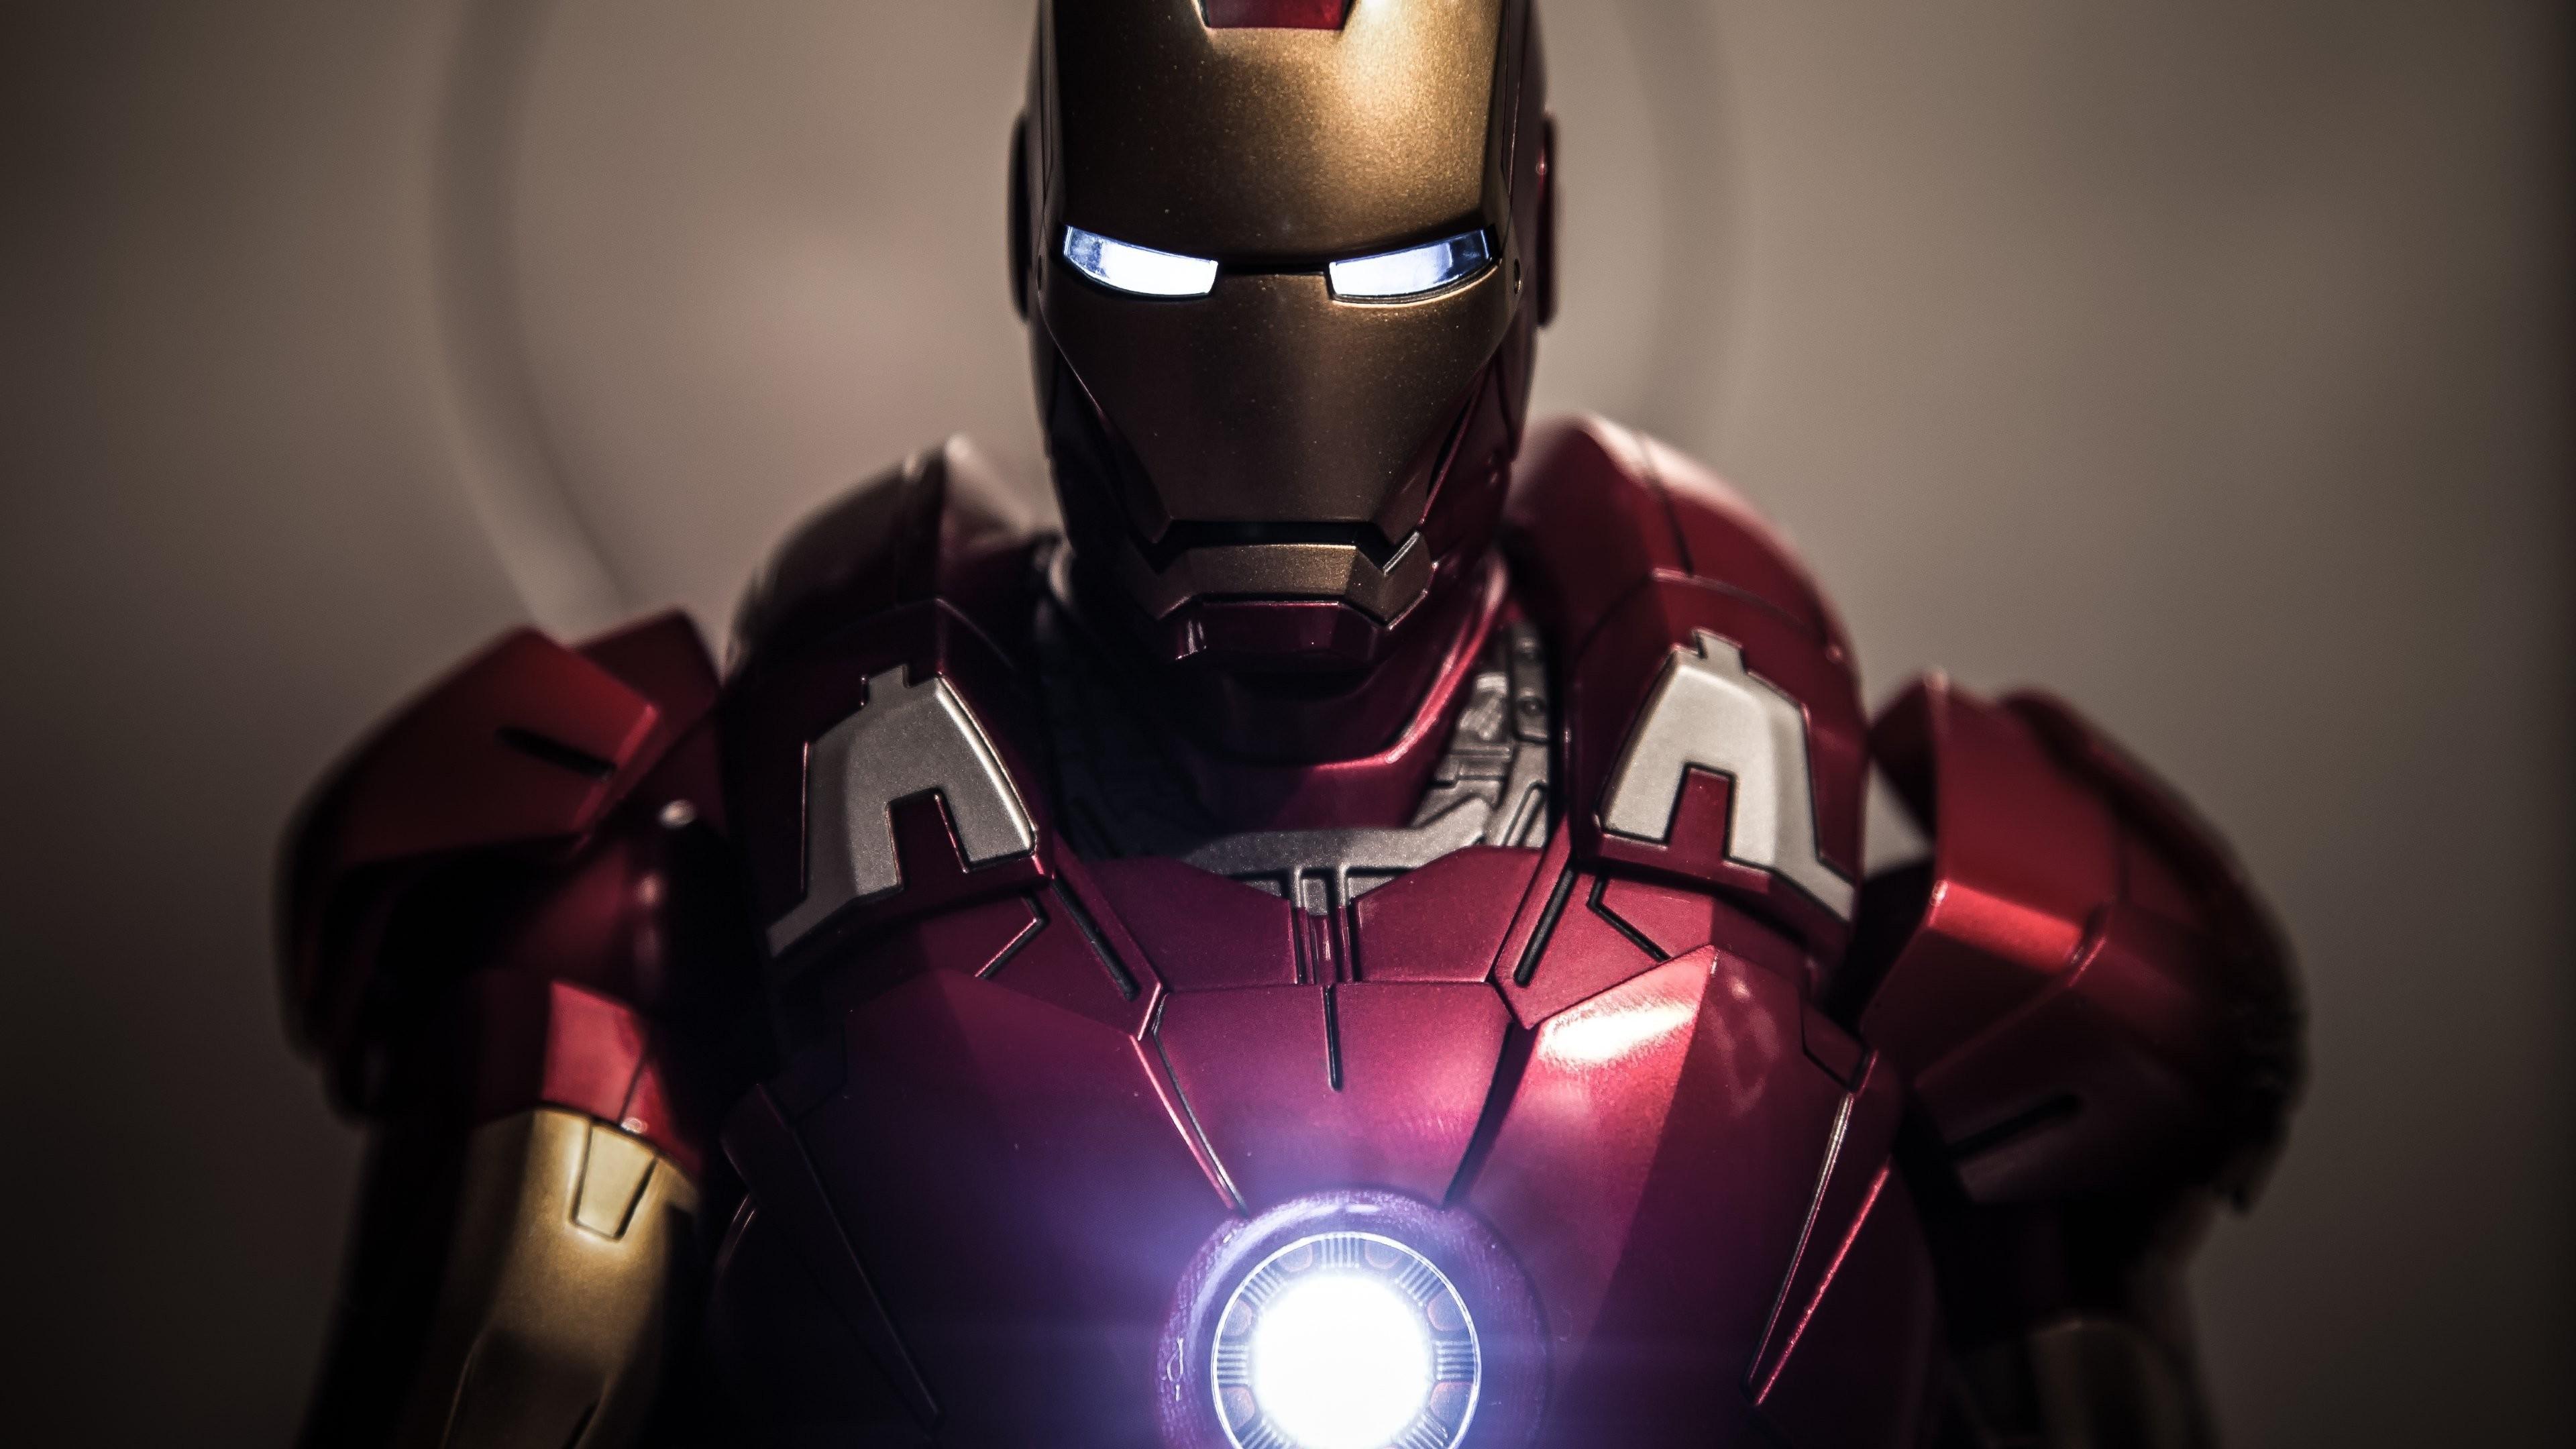 Desktop Wallpaper High Definition in 1080p with Iron Man Photos .